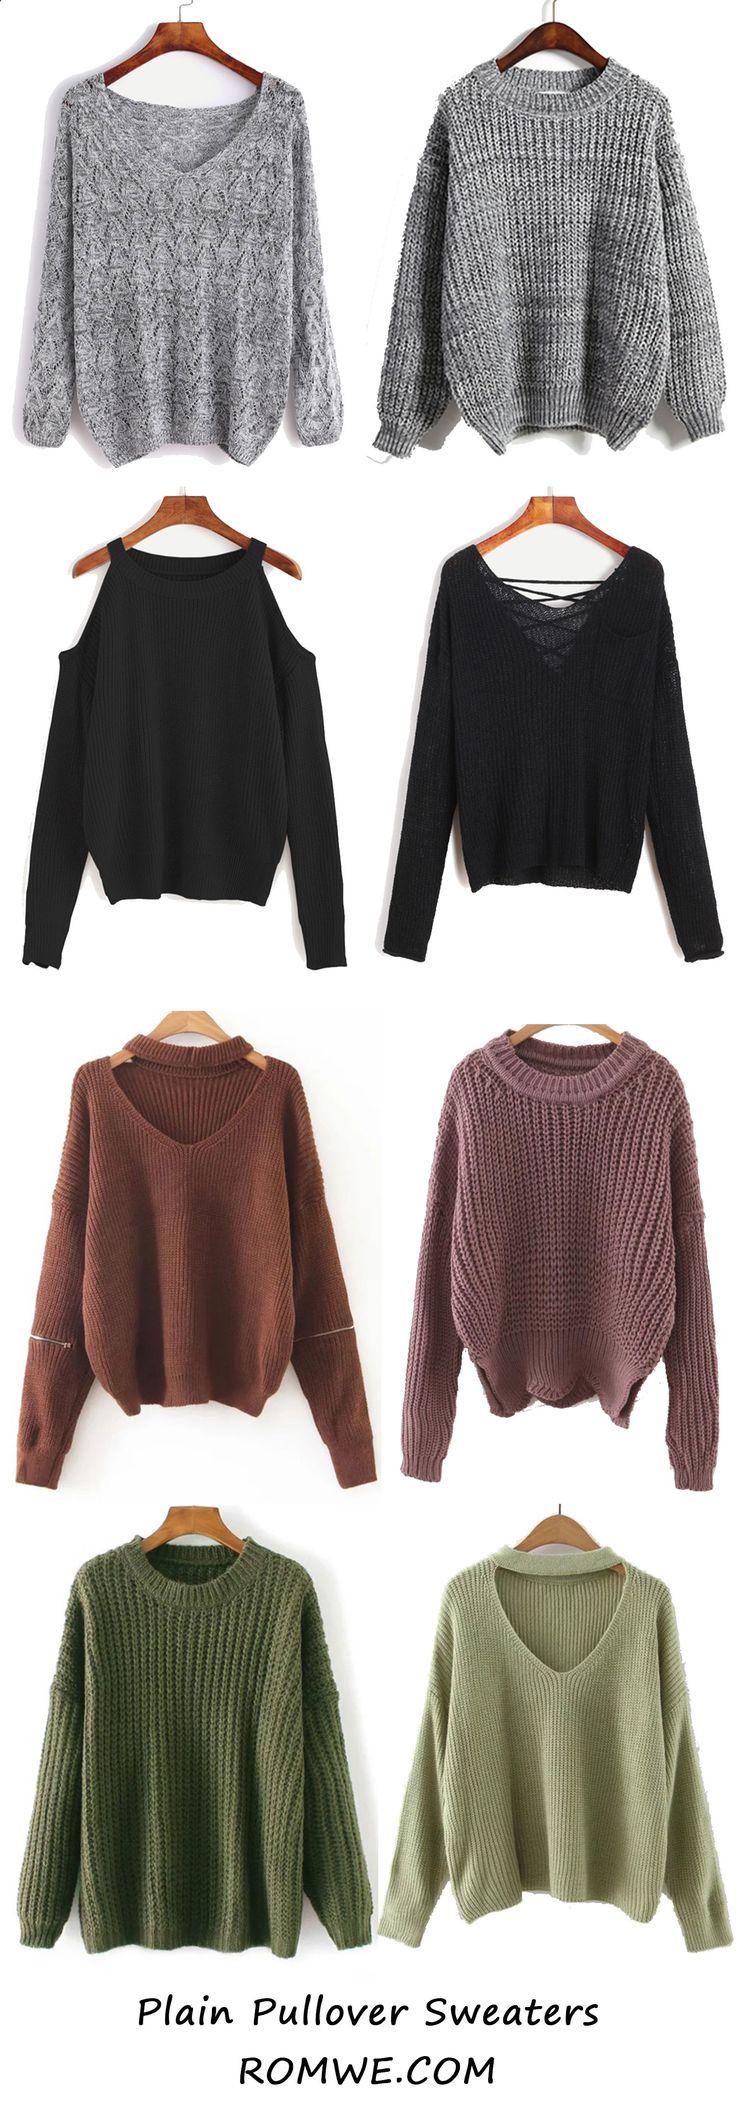 Fall Plain Sweaters from romwe.com